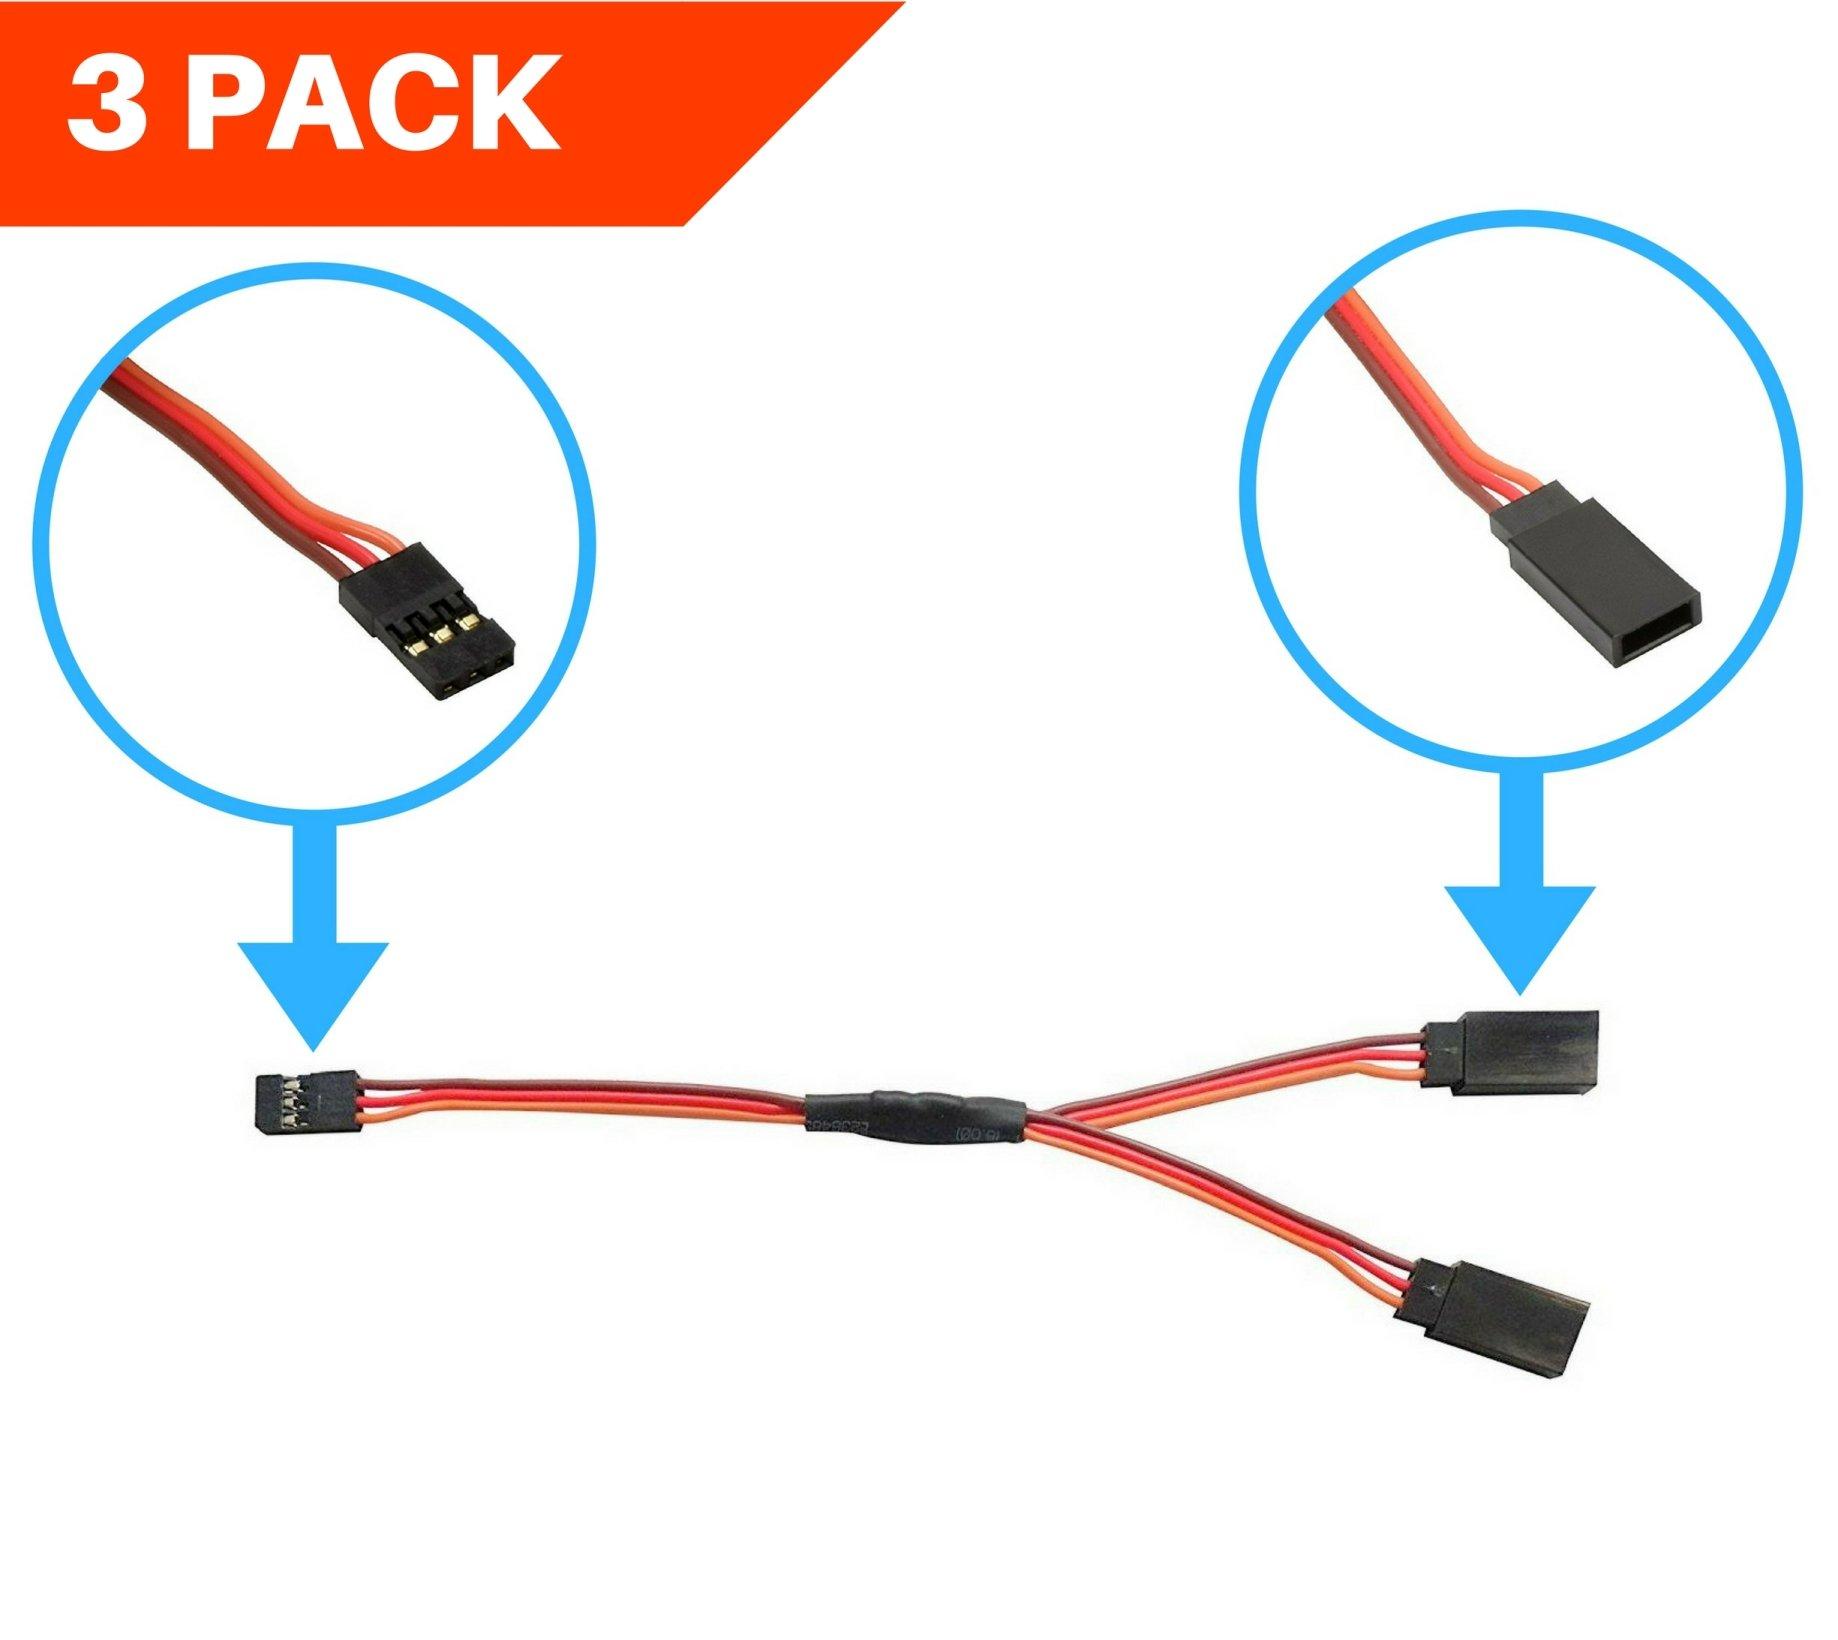 3 PACK 6  150mm JR  Spektrum  Hitec Style Servo Y Harness Apex RC Product